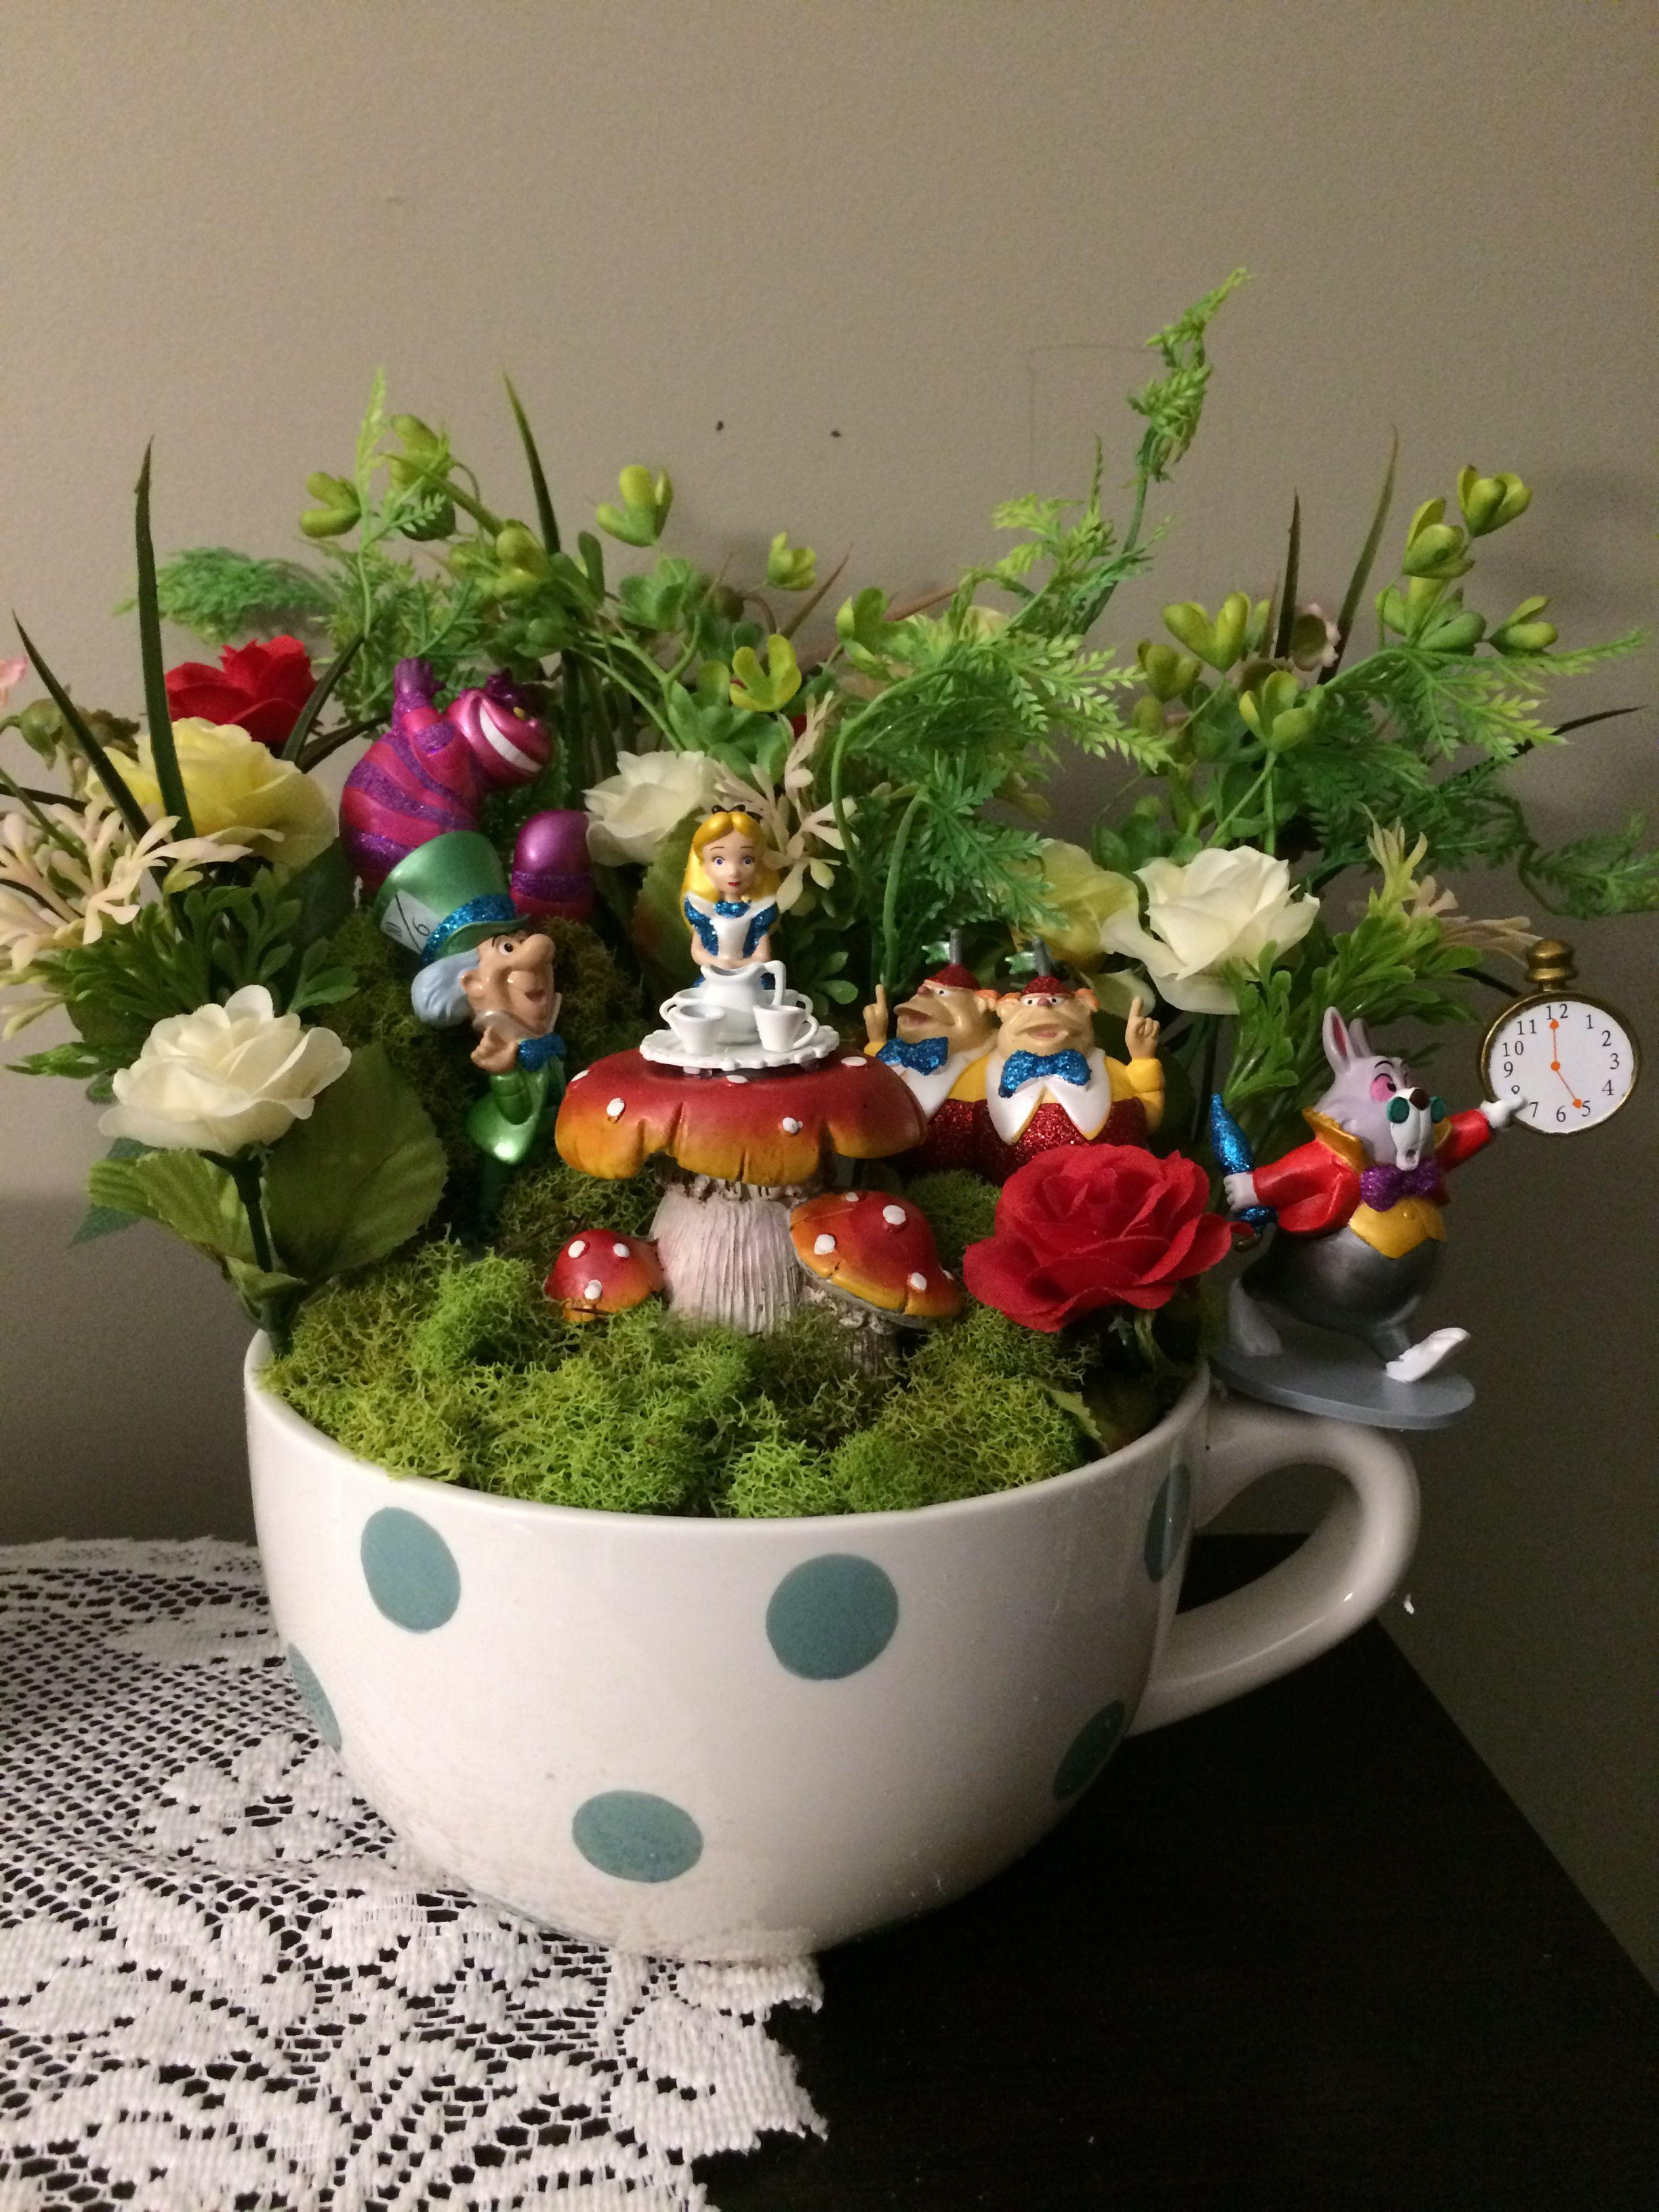 Disney Alice in Wonderland themed tea cup fairy garden